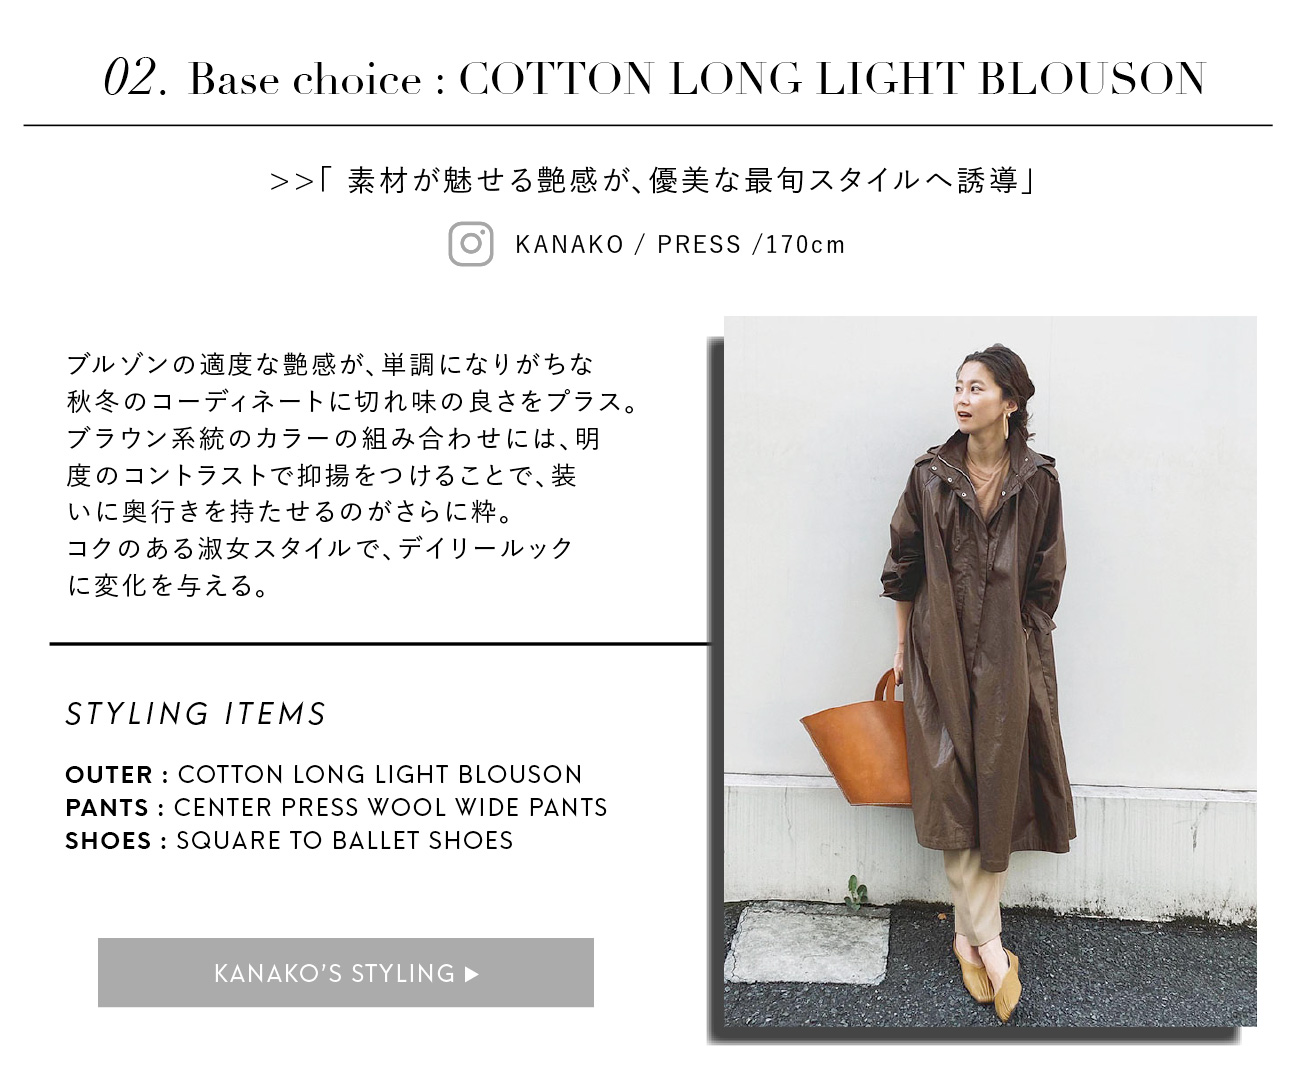 cotton long light blouson